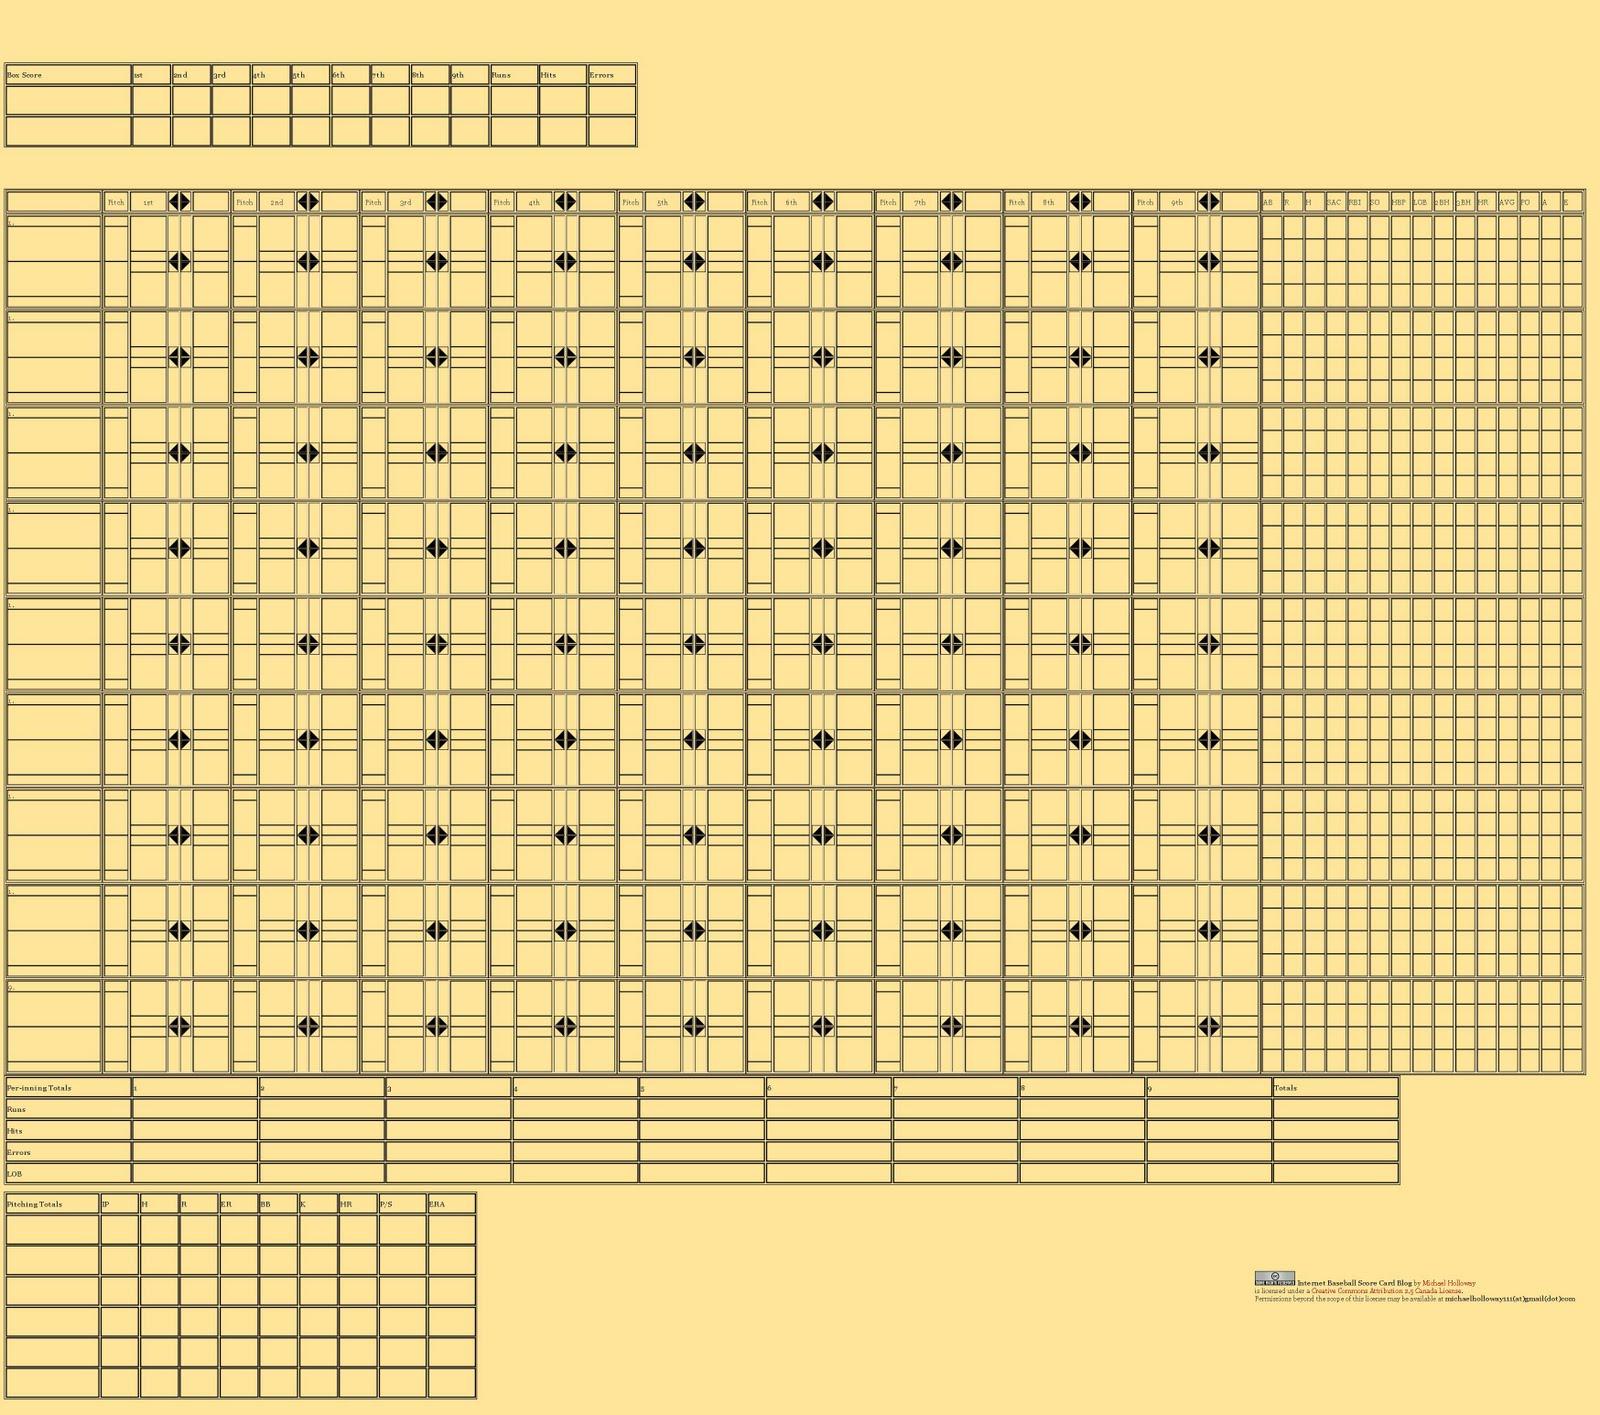 simple baseball score cards printable www